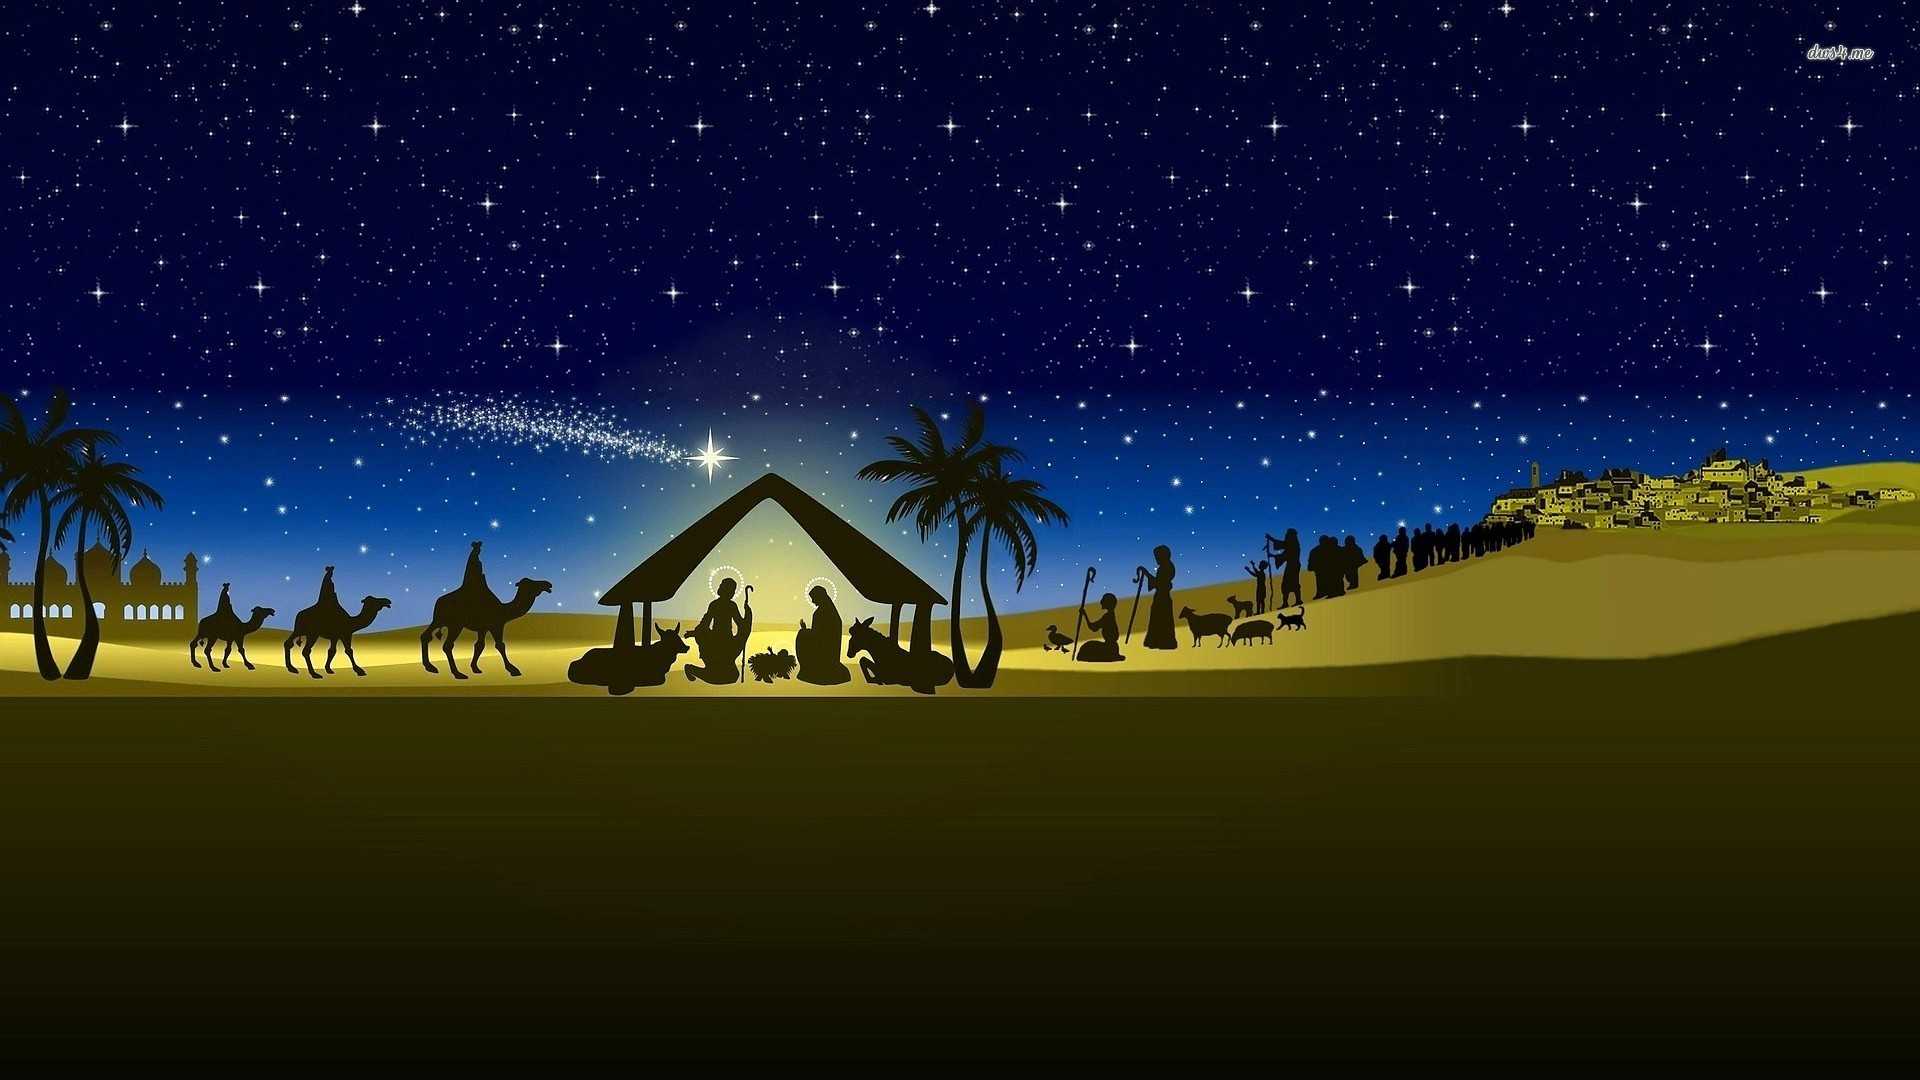 nativity scenes | Nativity scene Papel de Parede Imagem | Nativity Scenes |  Pinterest | Christmas nativity